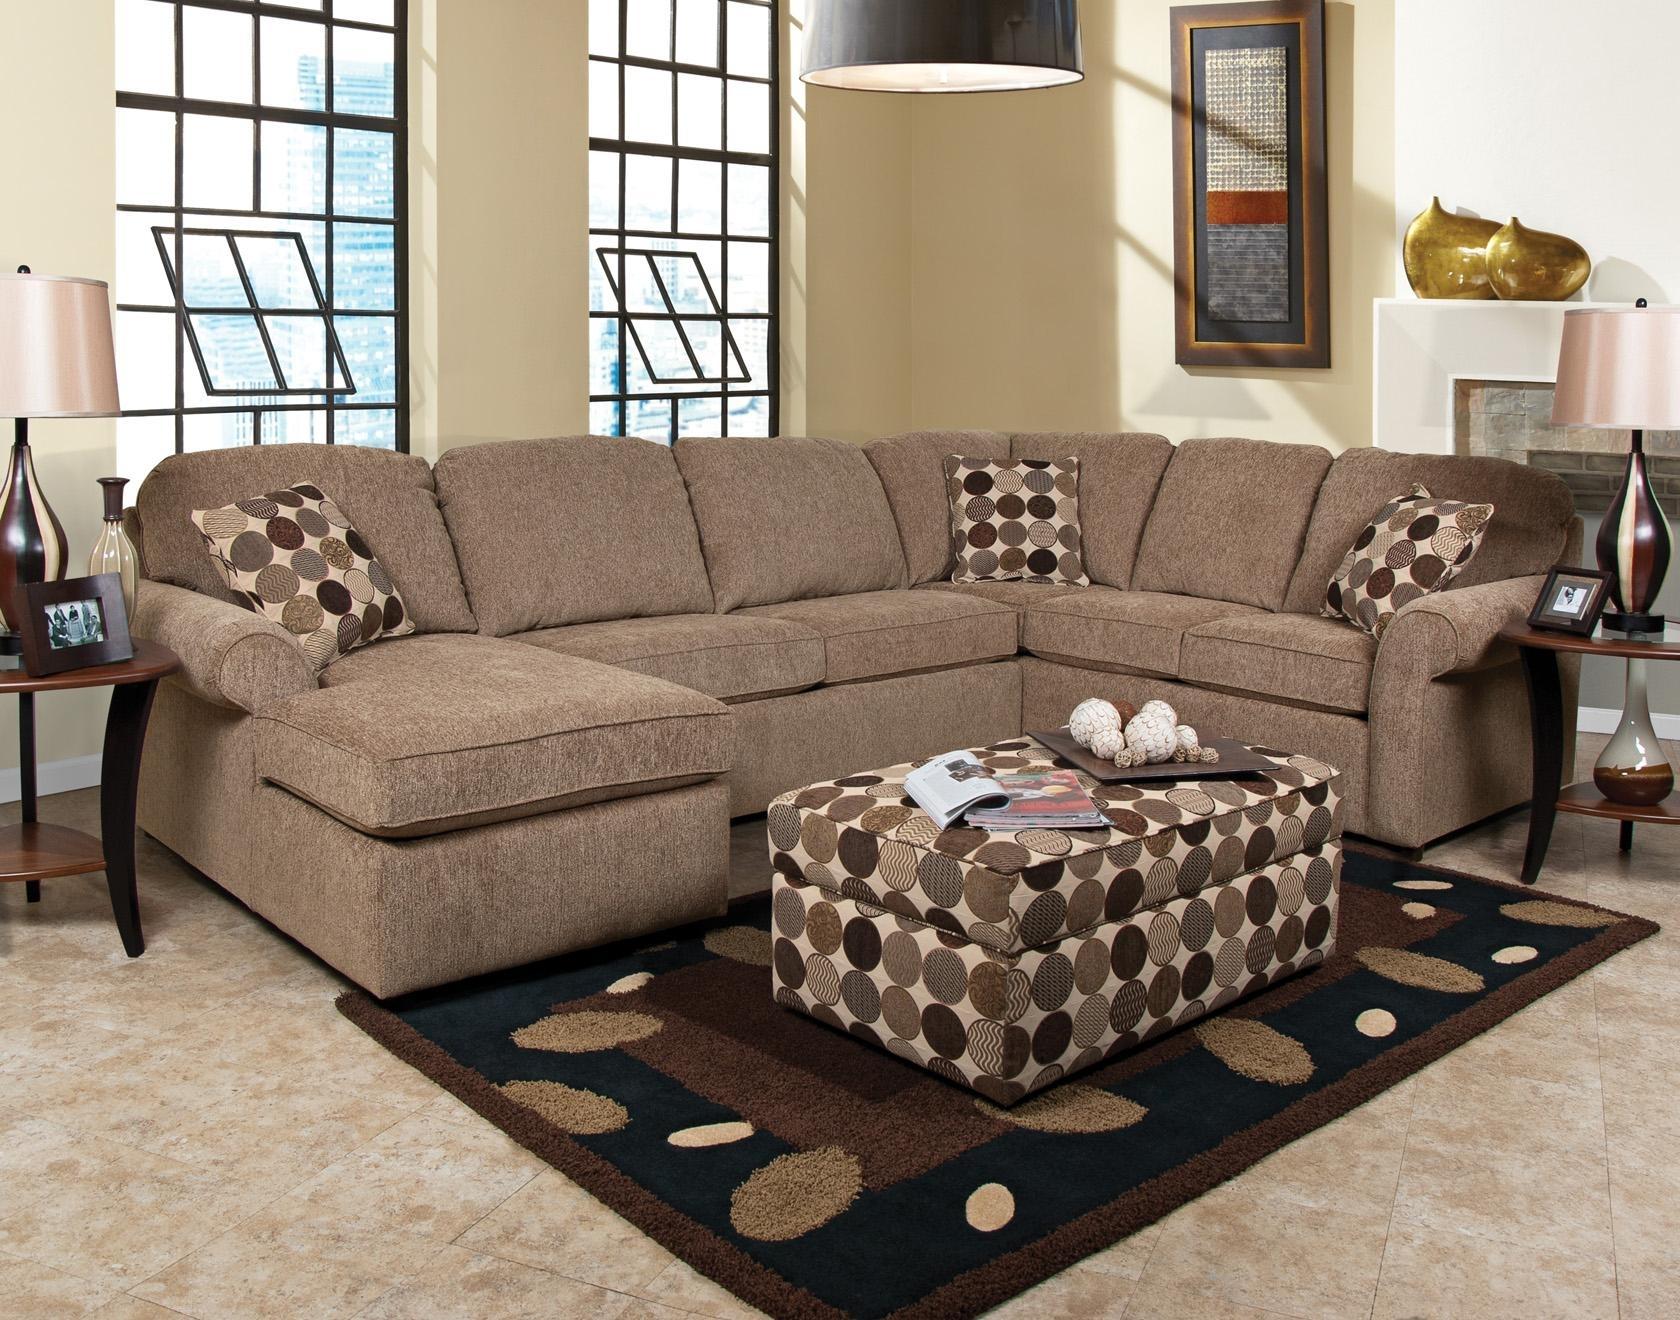 Malibu Sectional Sofa Sofa Beds Design Latest Trend Of